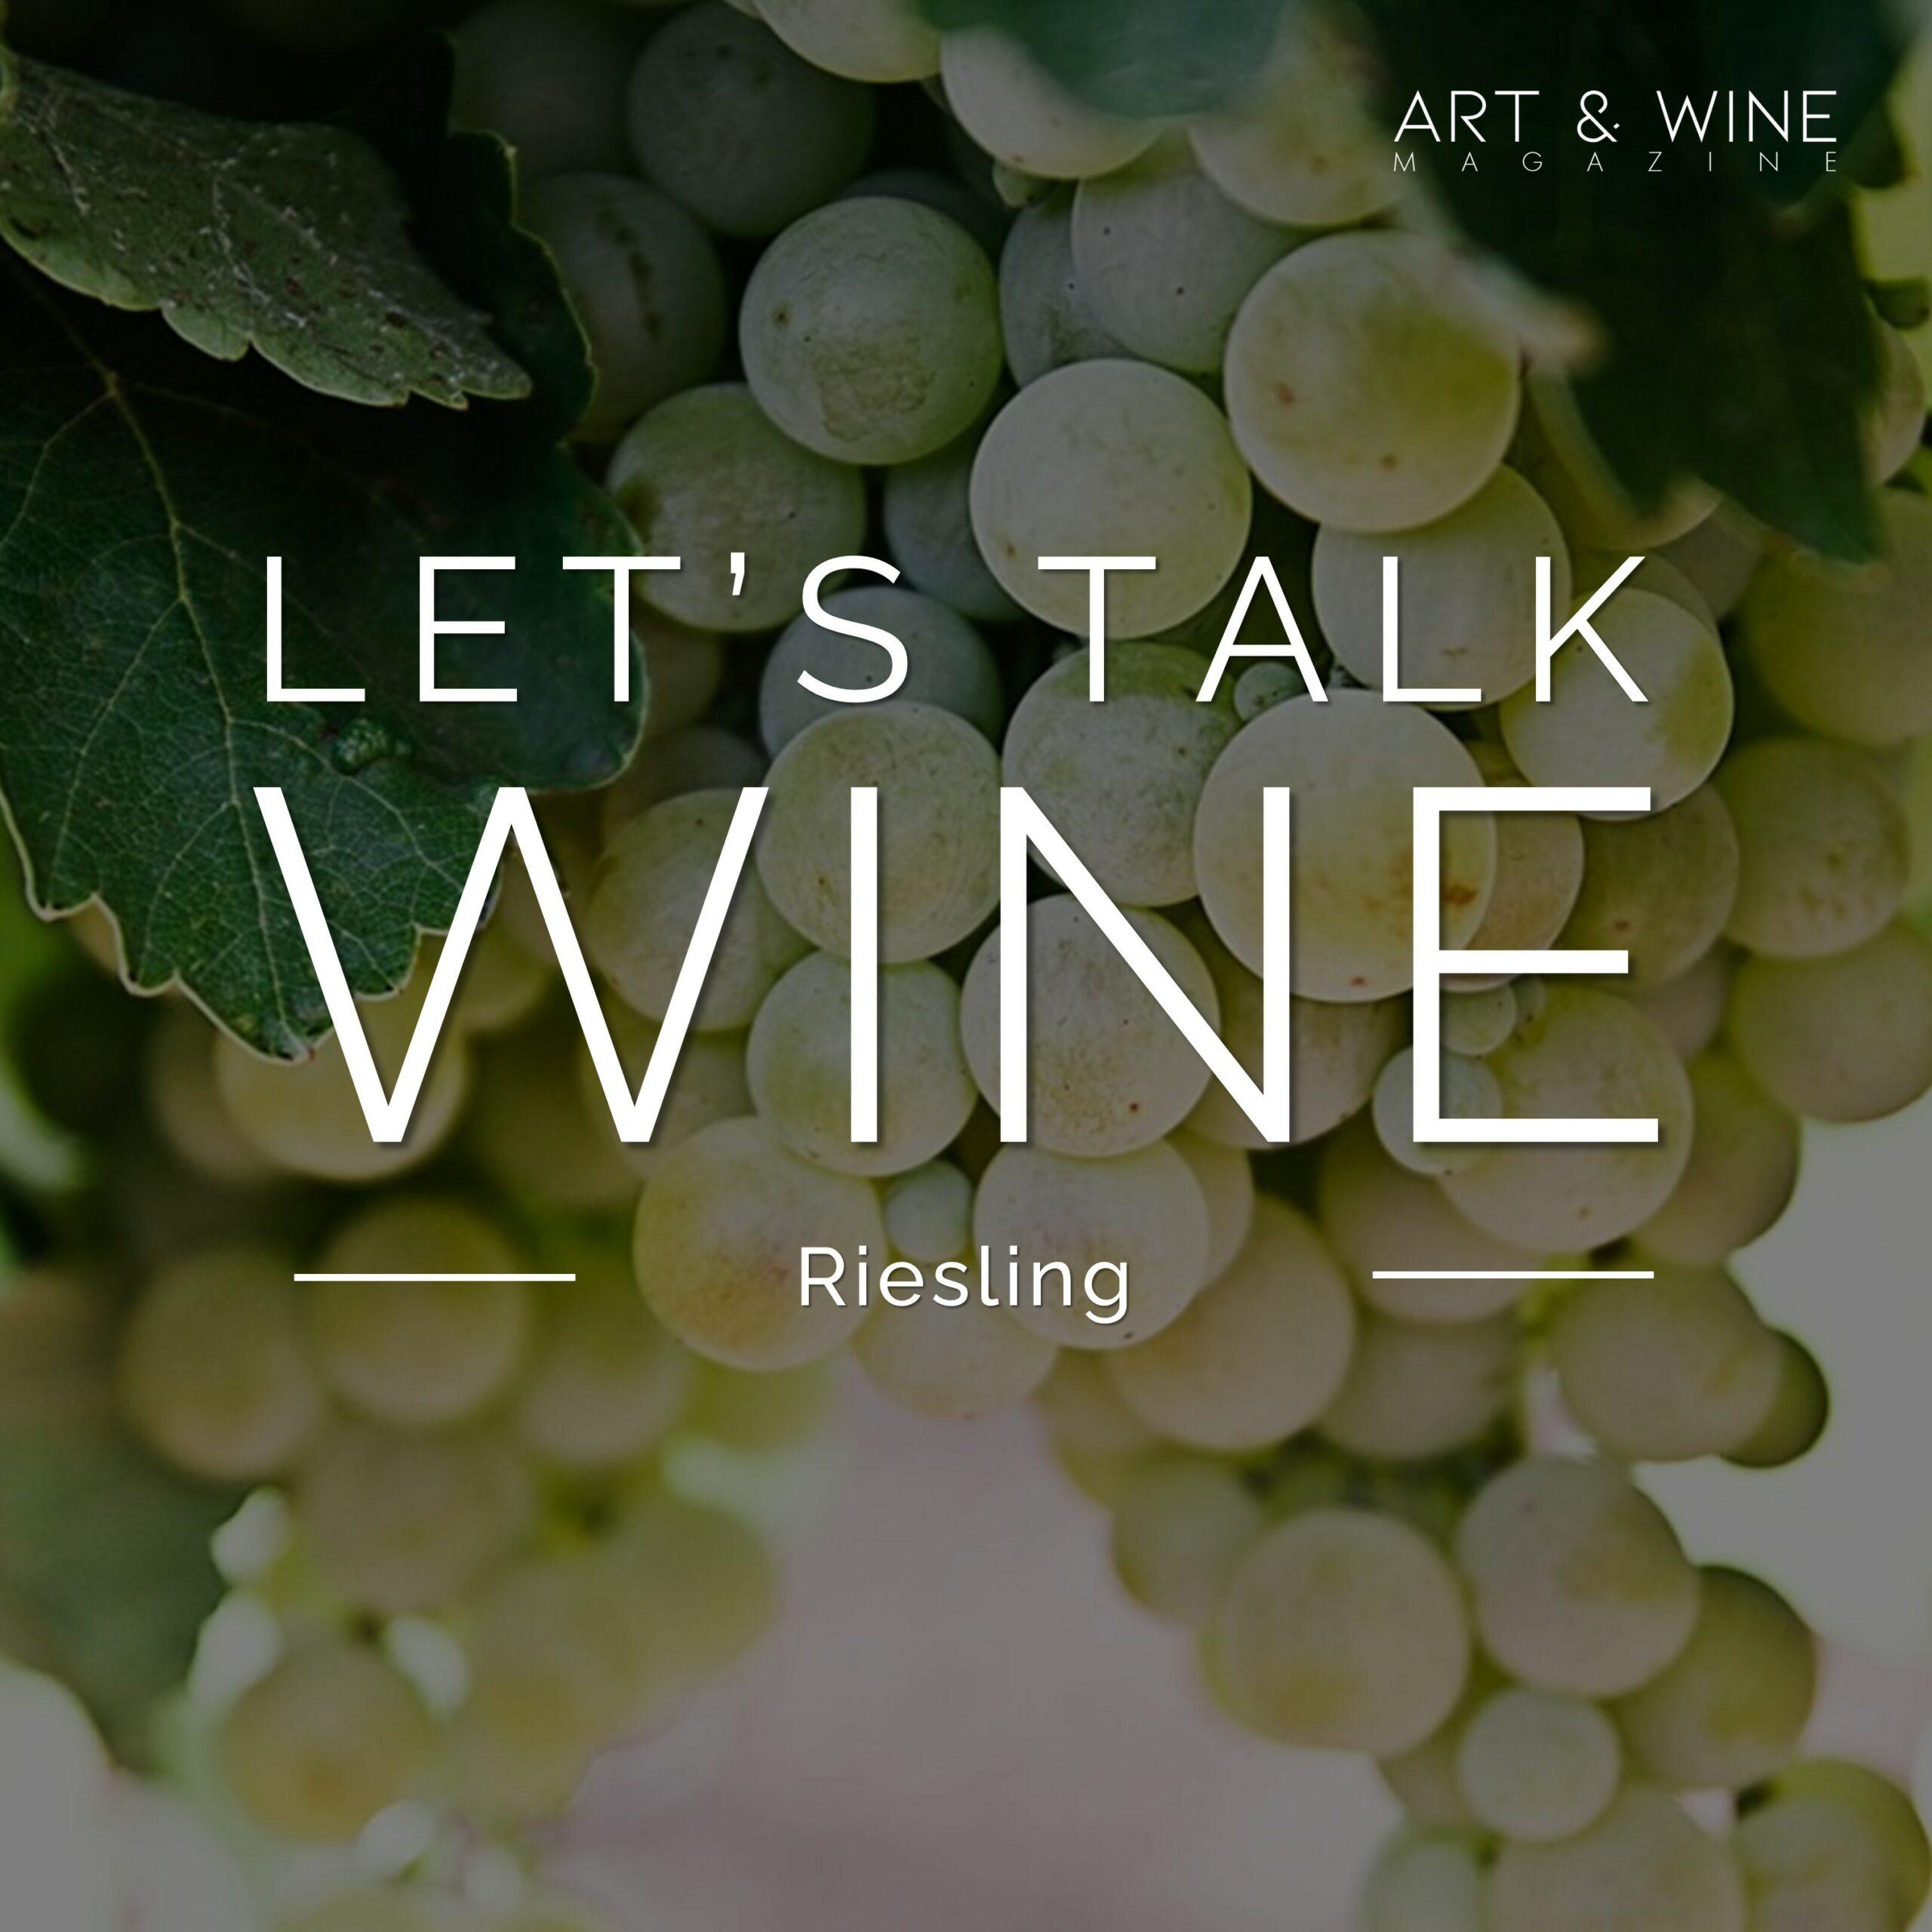 Let's talk Wine Malenka Stenner Riesling Podcast